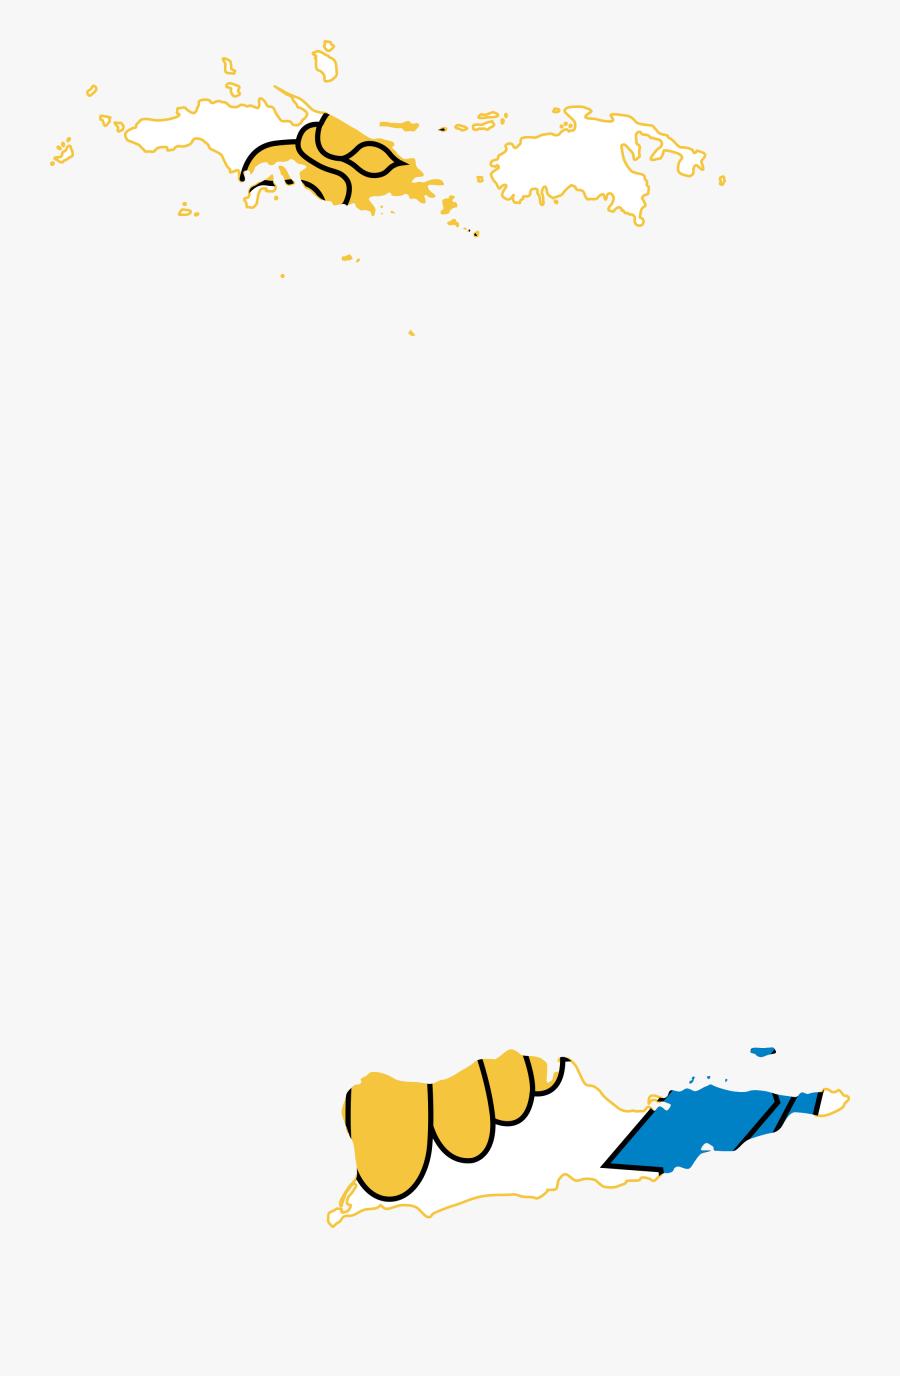 United States Virgin Islands - Us Virgin Islands Flag Map, Transparent Clipart